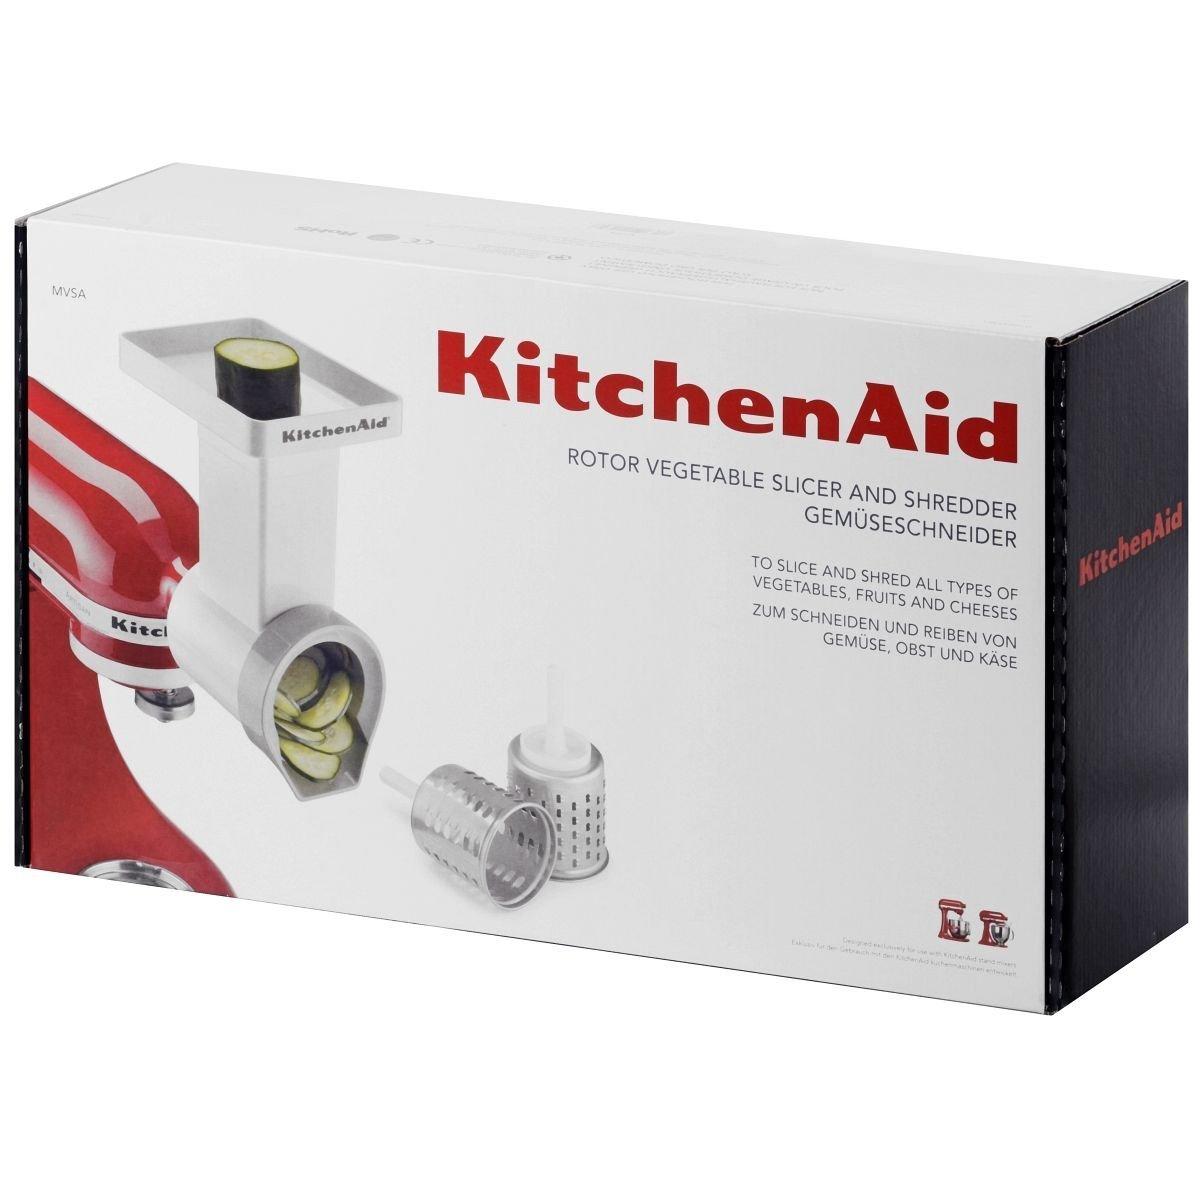 Набор насадок для овощерезки с 3 ножами, 4 пр. KitchenAid  Стальной (MVSA) KitchenAid MVSA фото 1